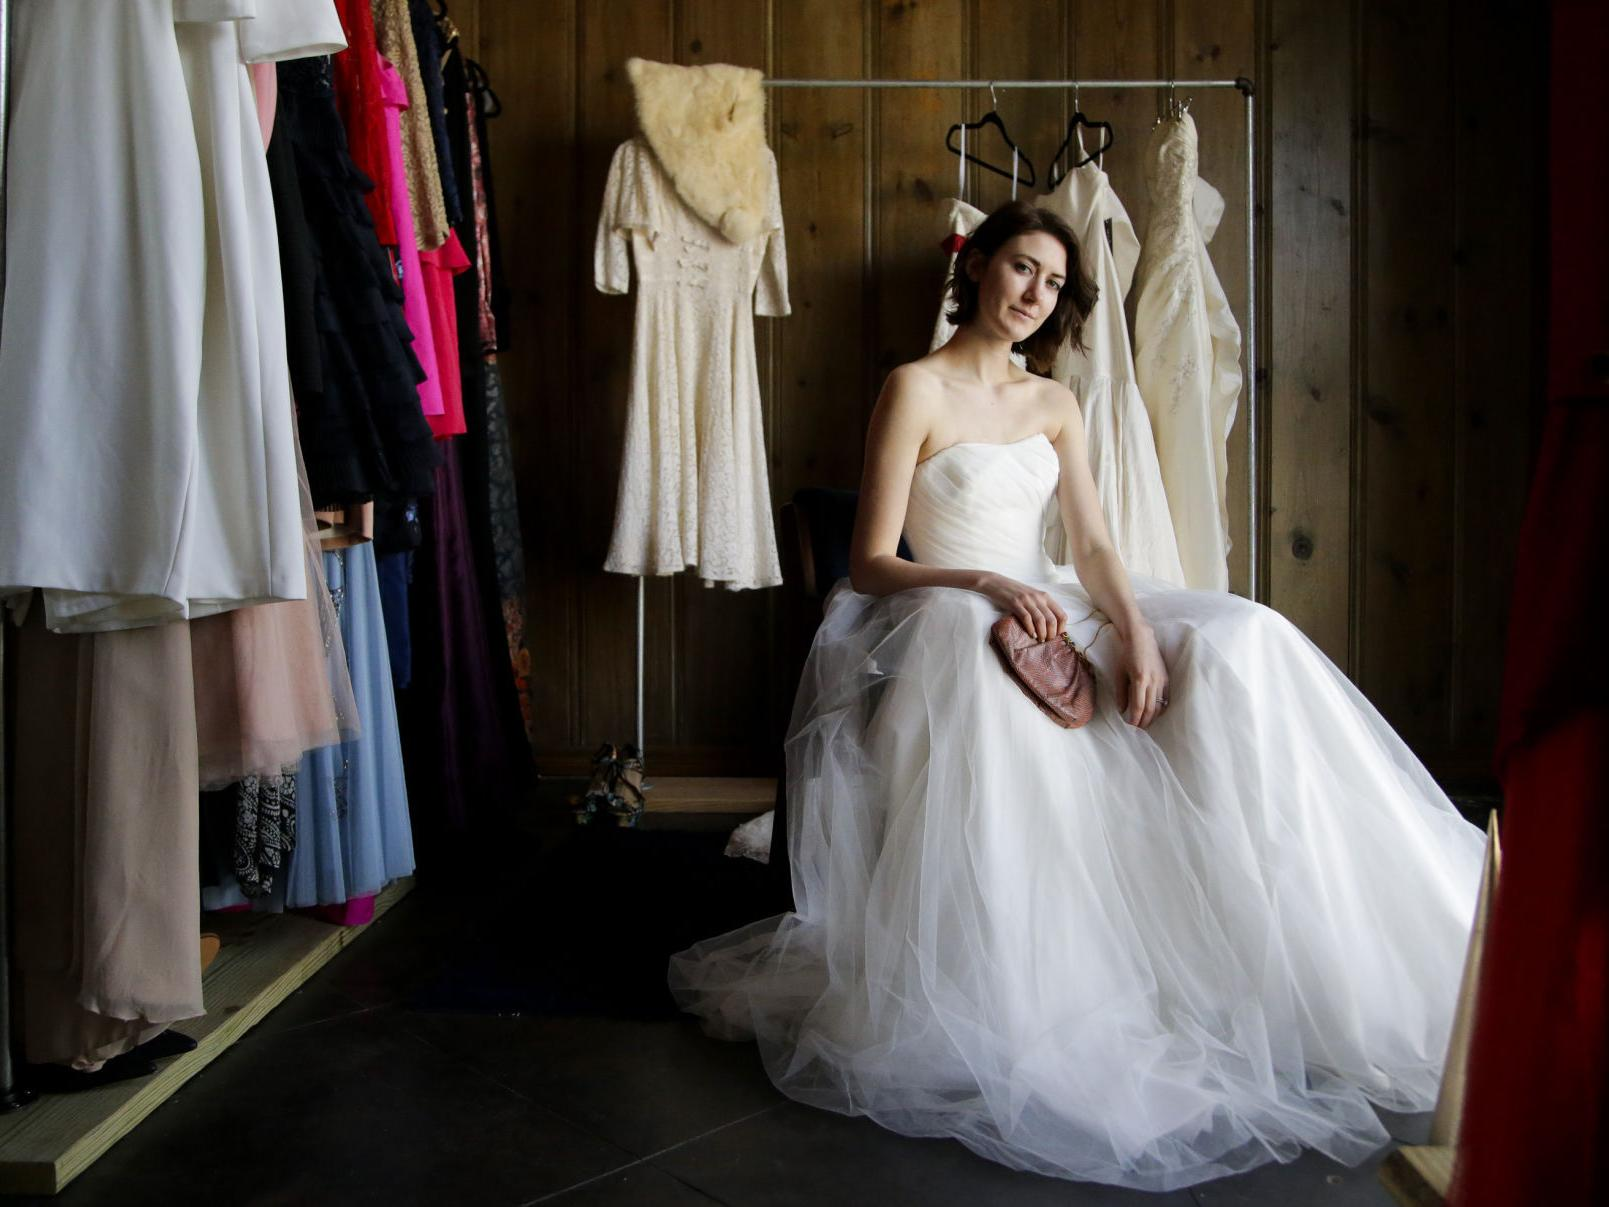 Why Buy Vintage And Resale Wedding Dresses Lifestyles Tulsaworld Com